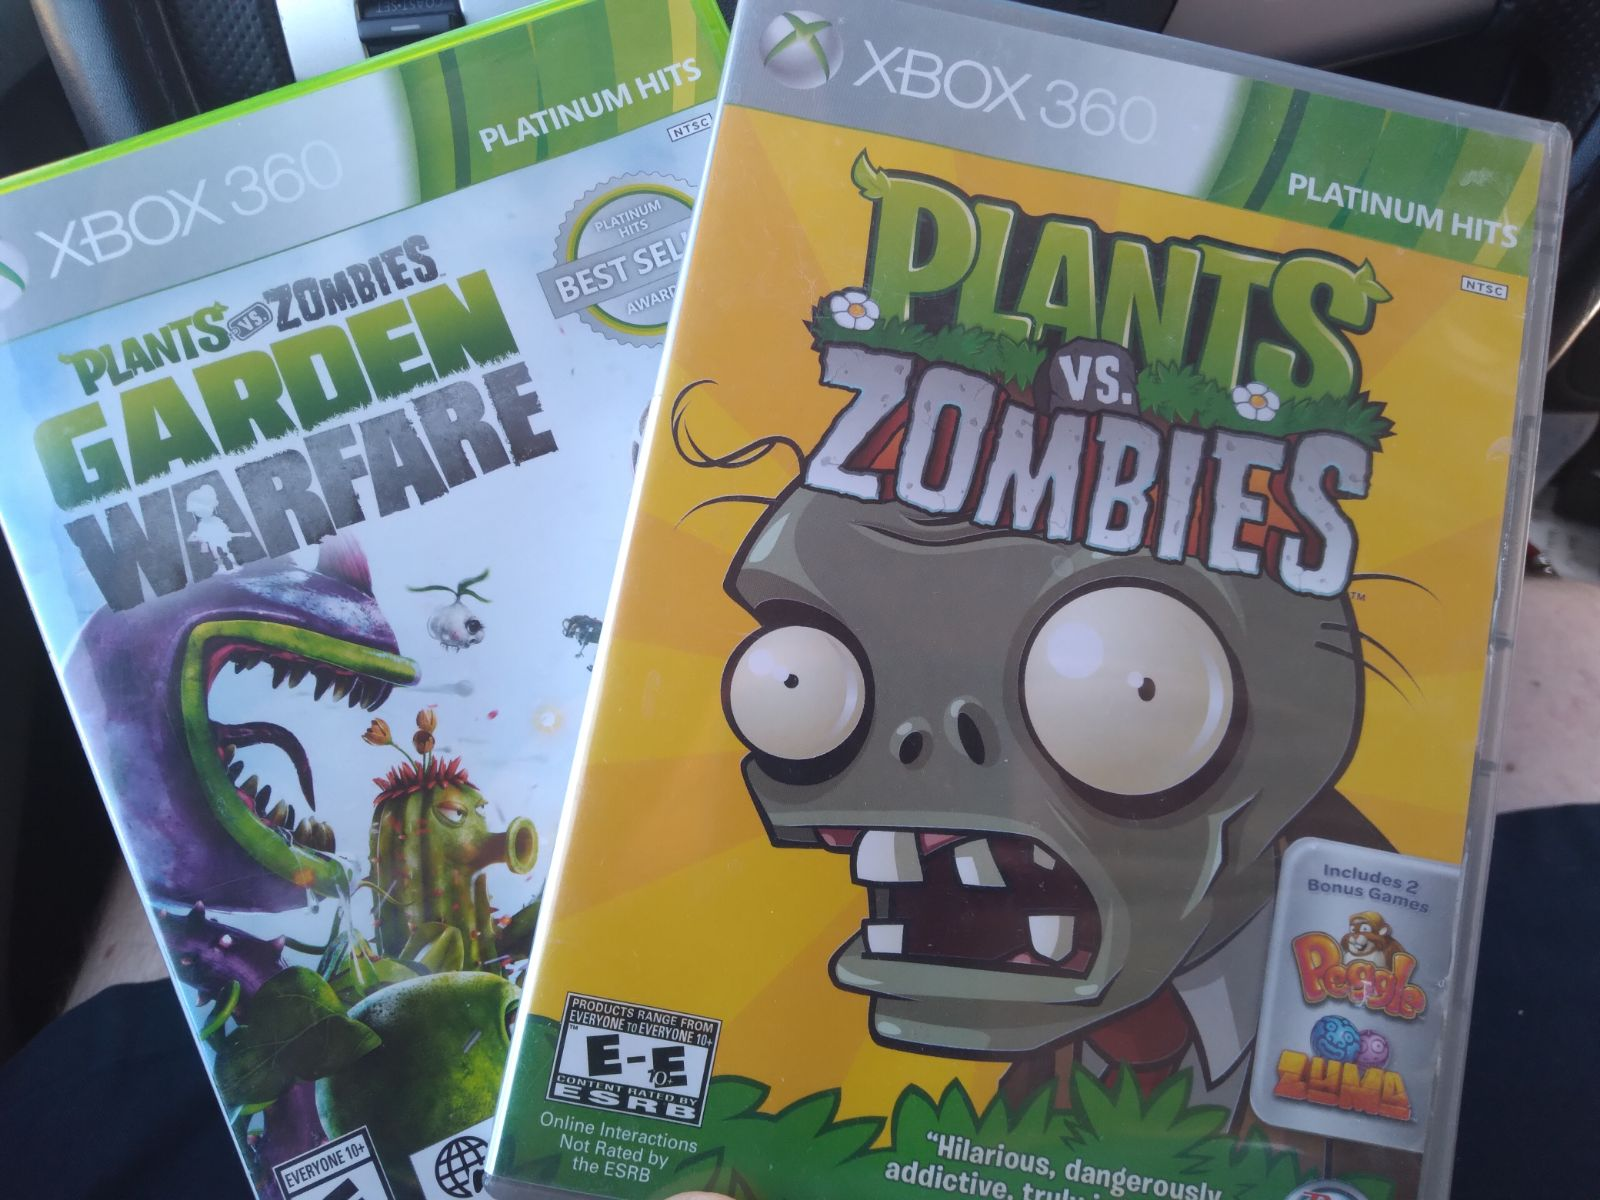 Plants Vs zombies Xbox 360 Bundle